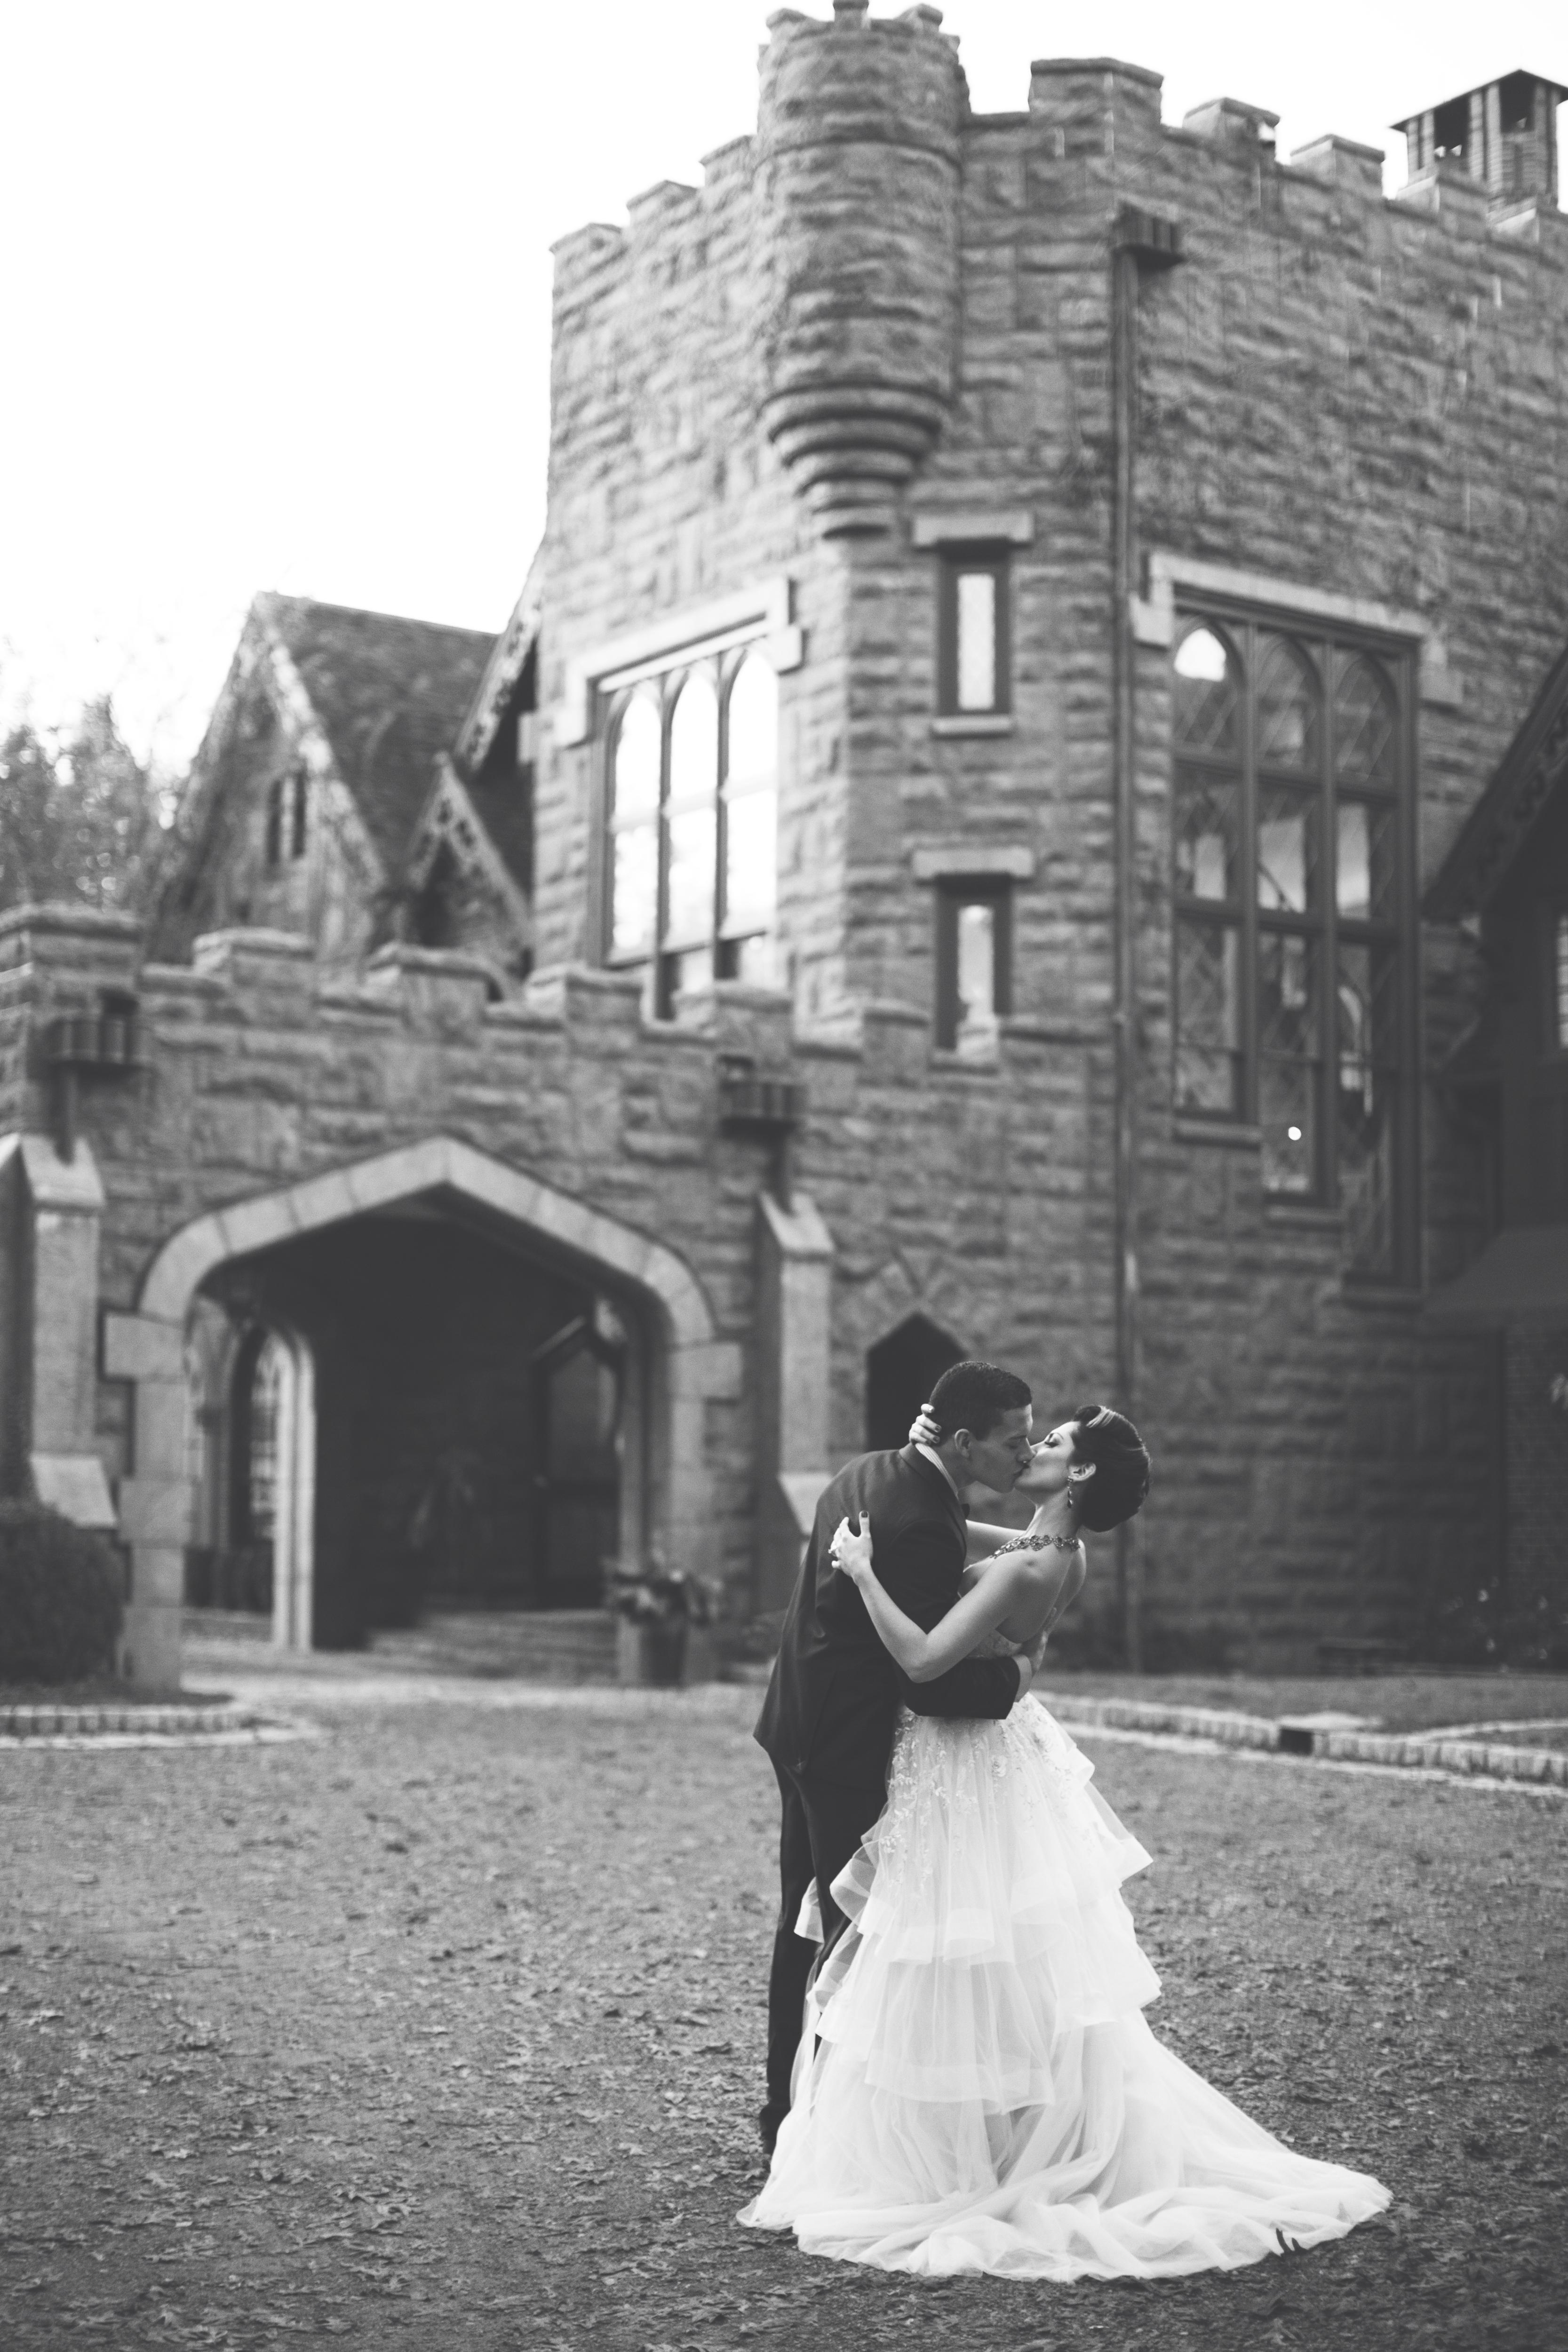 Castle Wedding - Gillian Marto Creating Events of a Lifetime